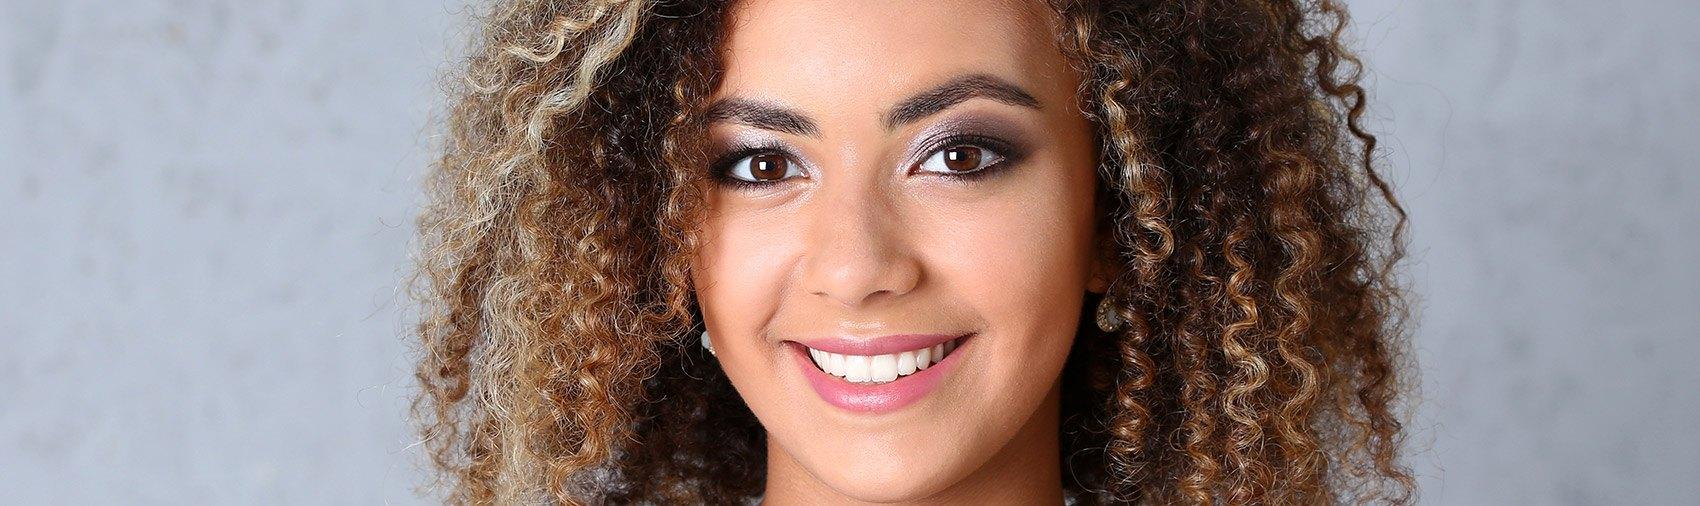 Teeth Whitening - Meredith Levine, DDS, Inc.